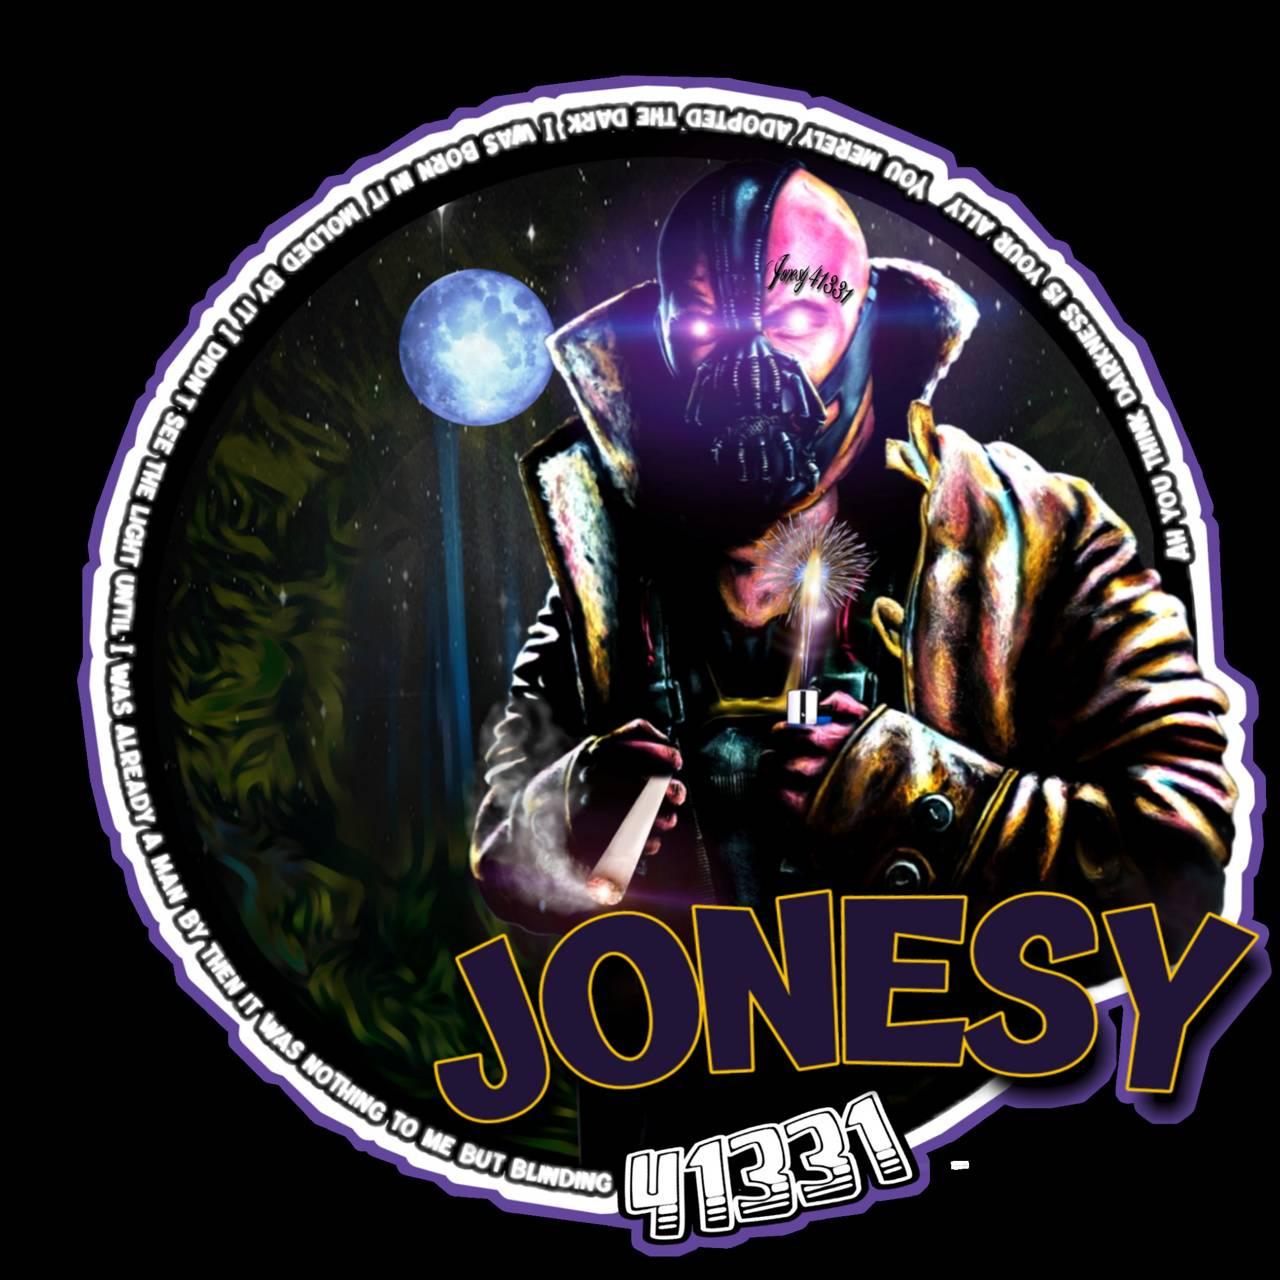 BANE AKA JONESY41331